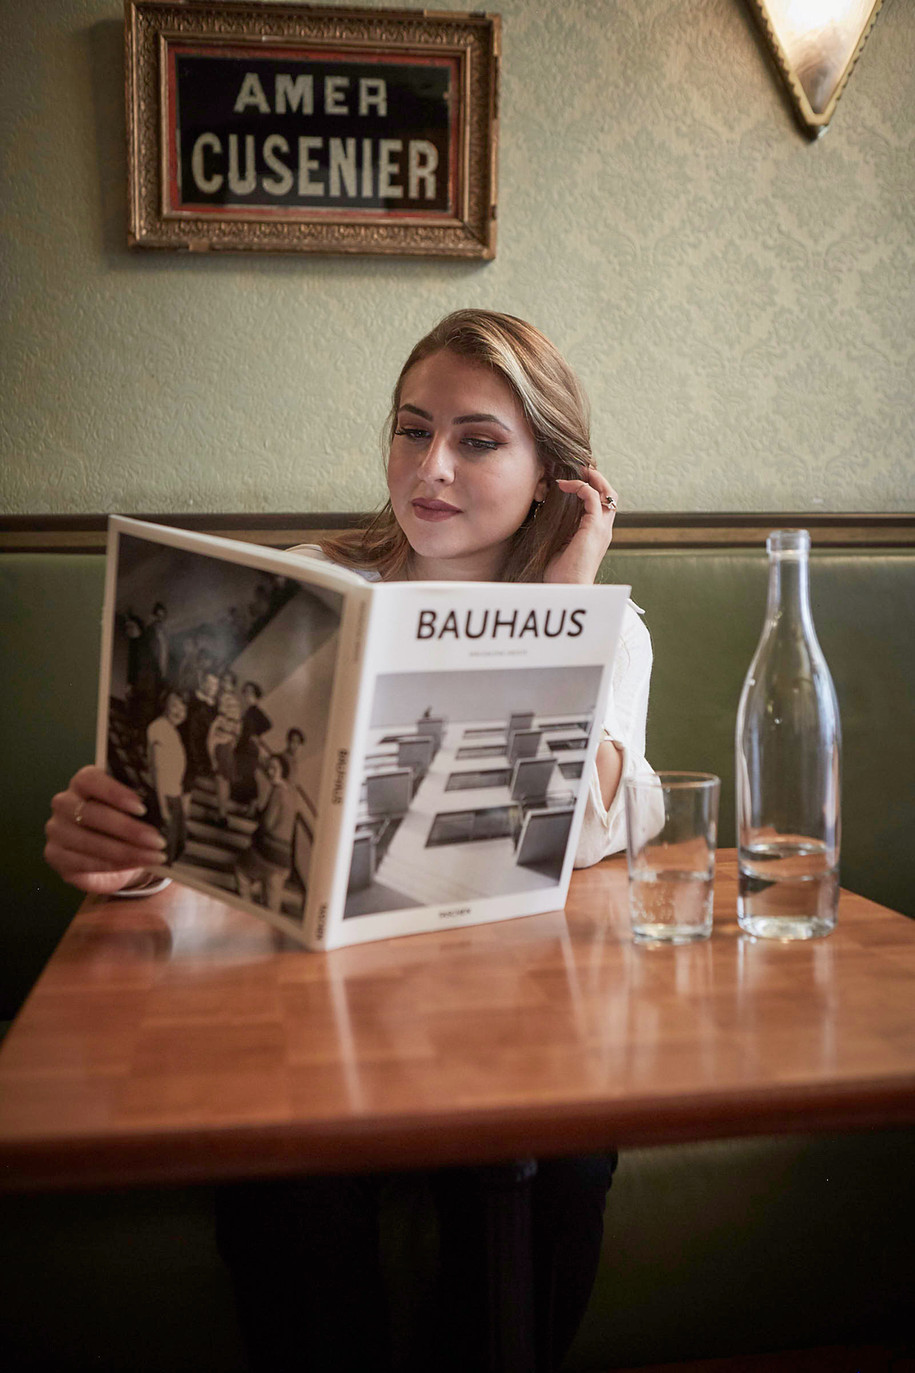 mahrooz-hamburg-fotograf-jeffery-berlin-